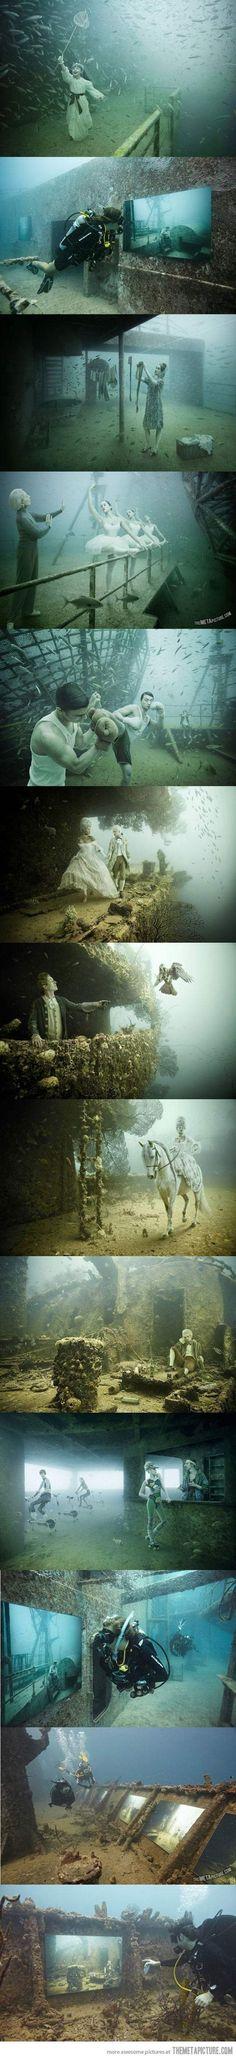 Underwater museum in Cancun